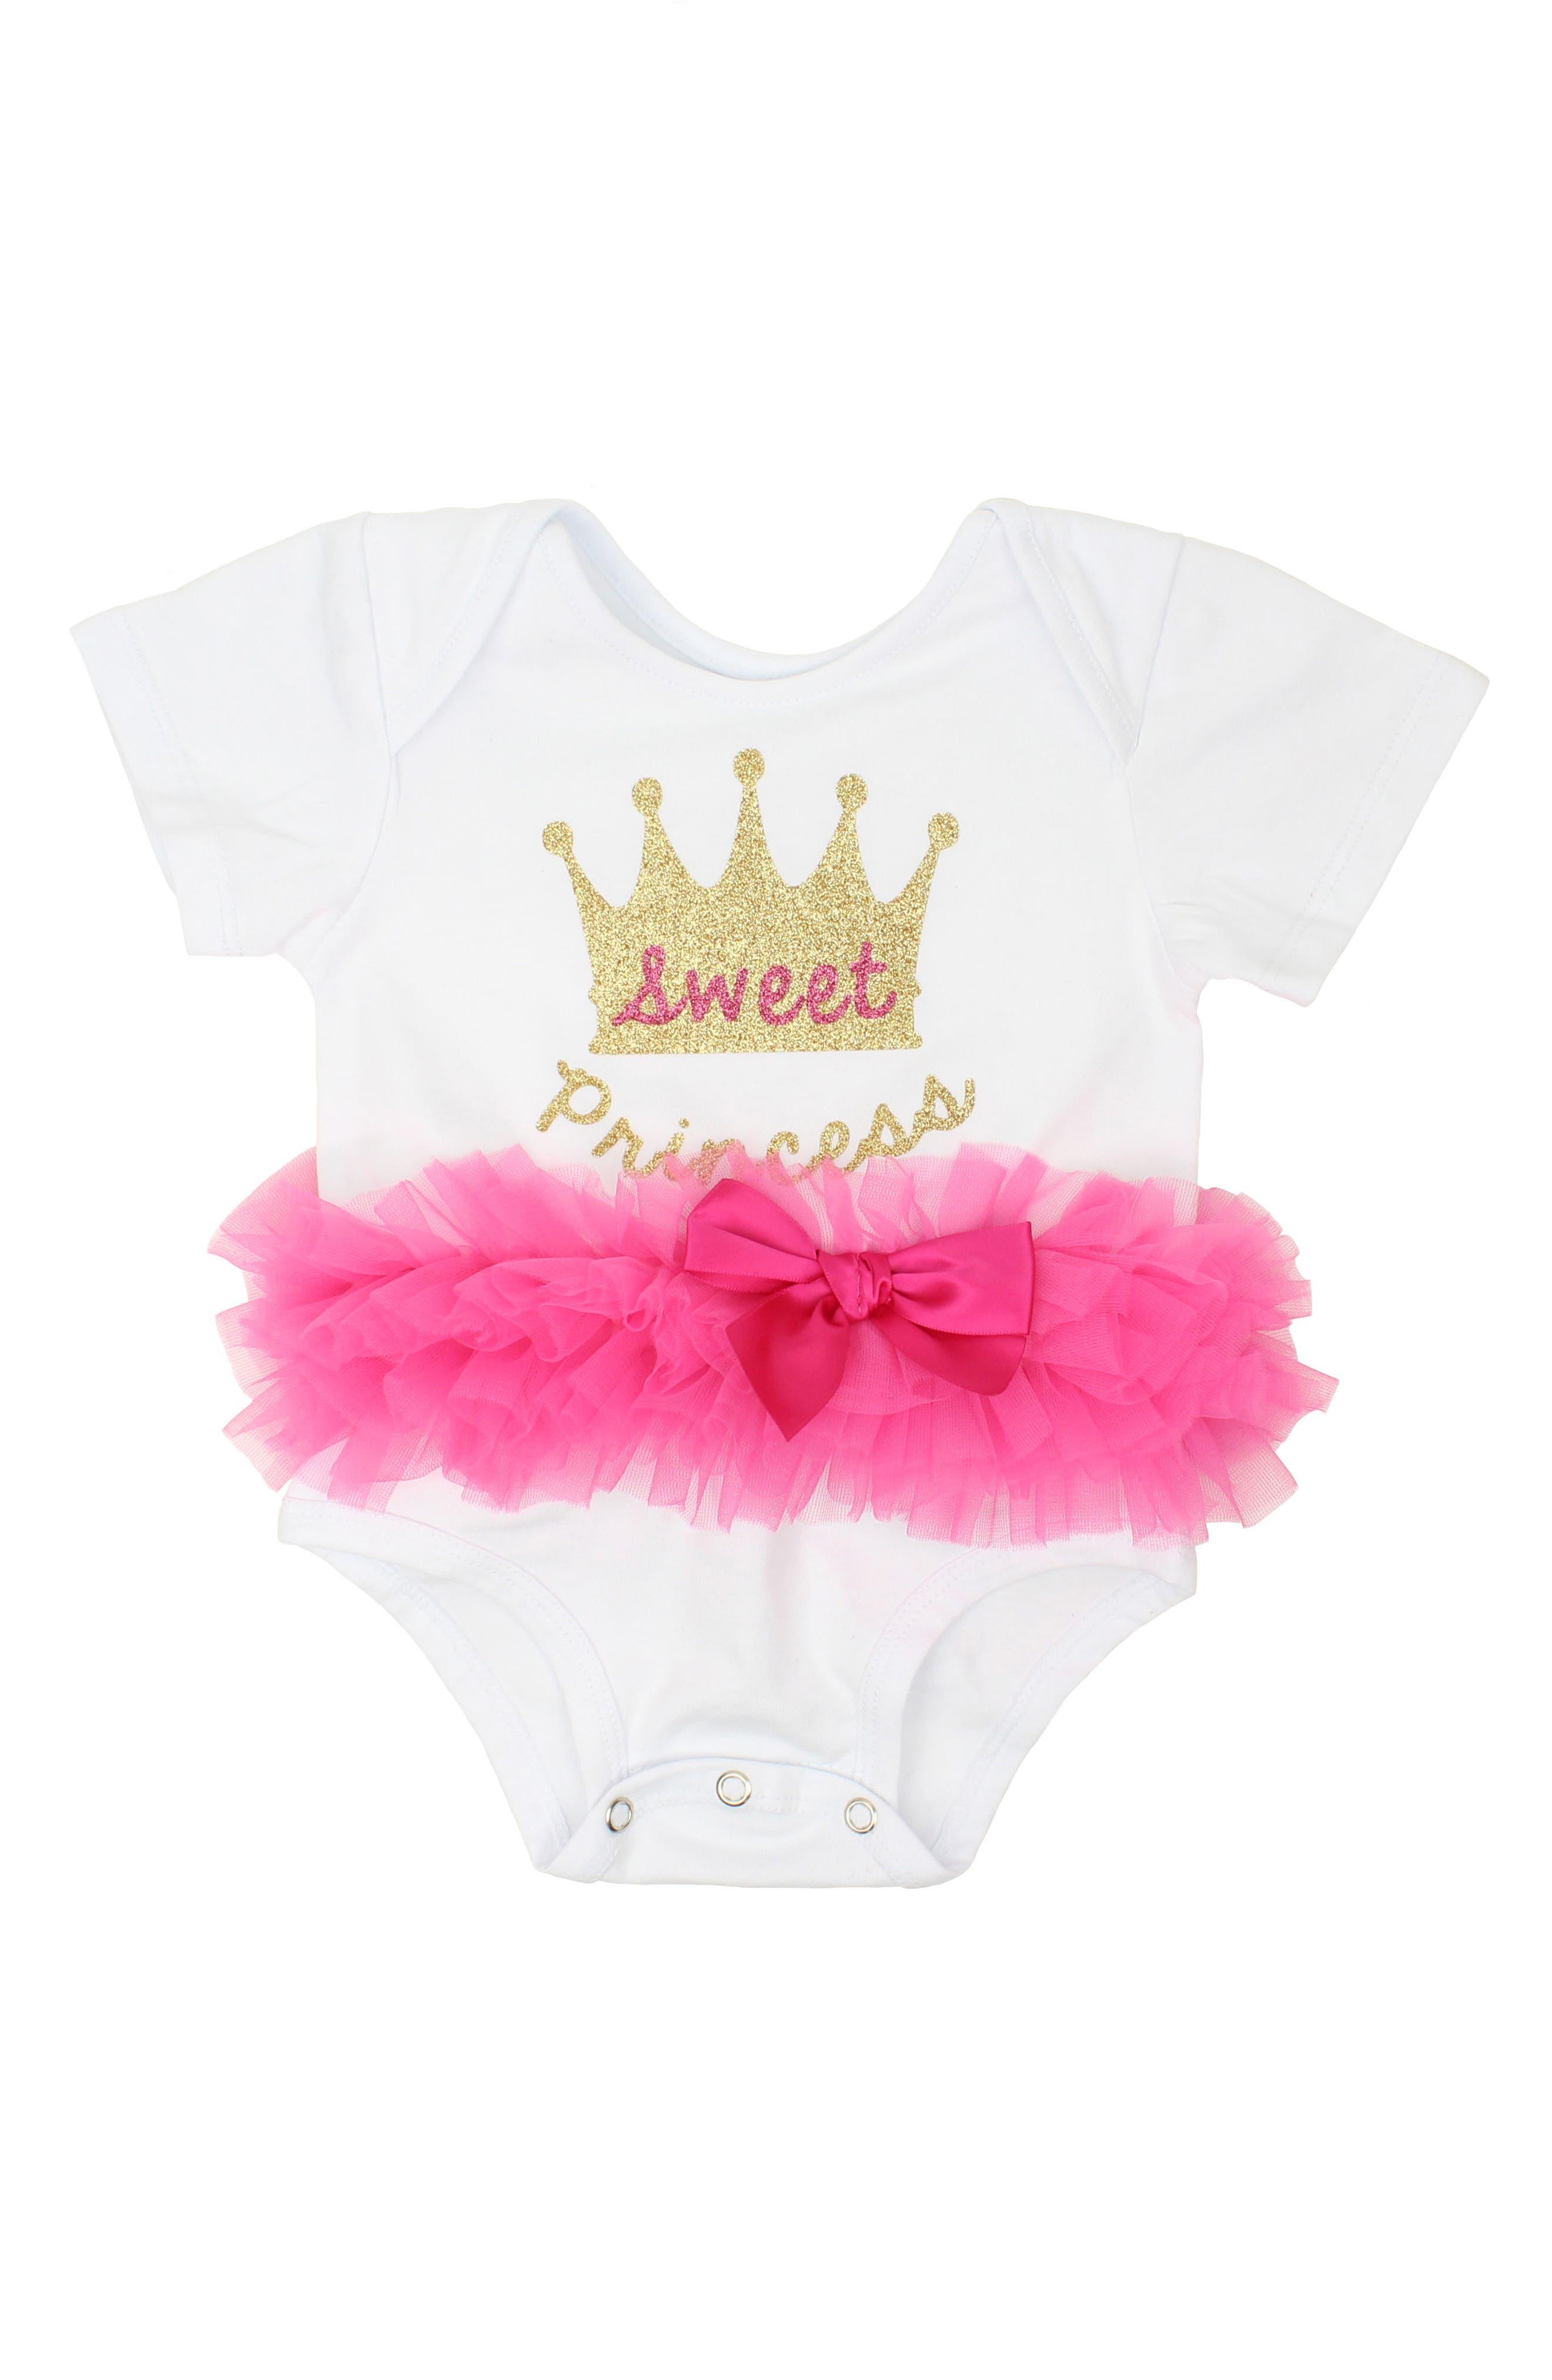 Sweet Princess Tutu Bodysuit,                             Main thumbnail 1, color,                             Hot Pink